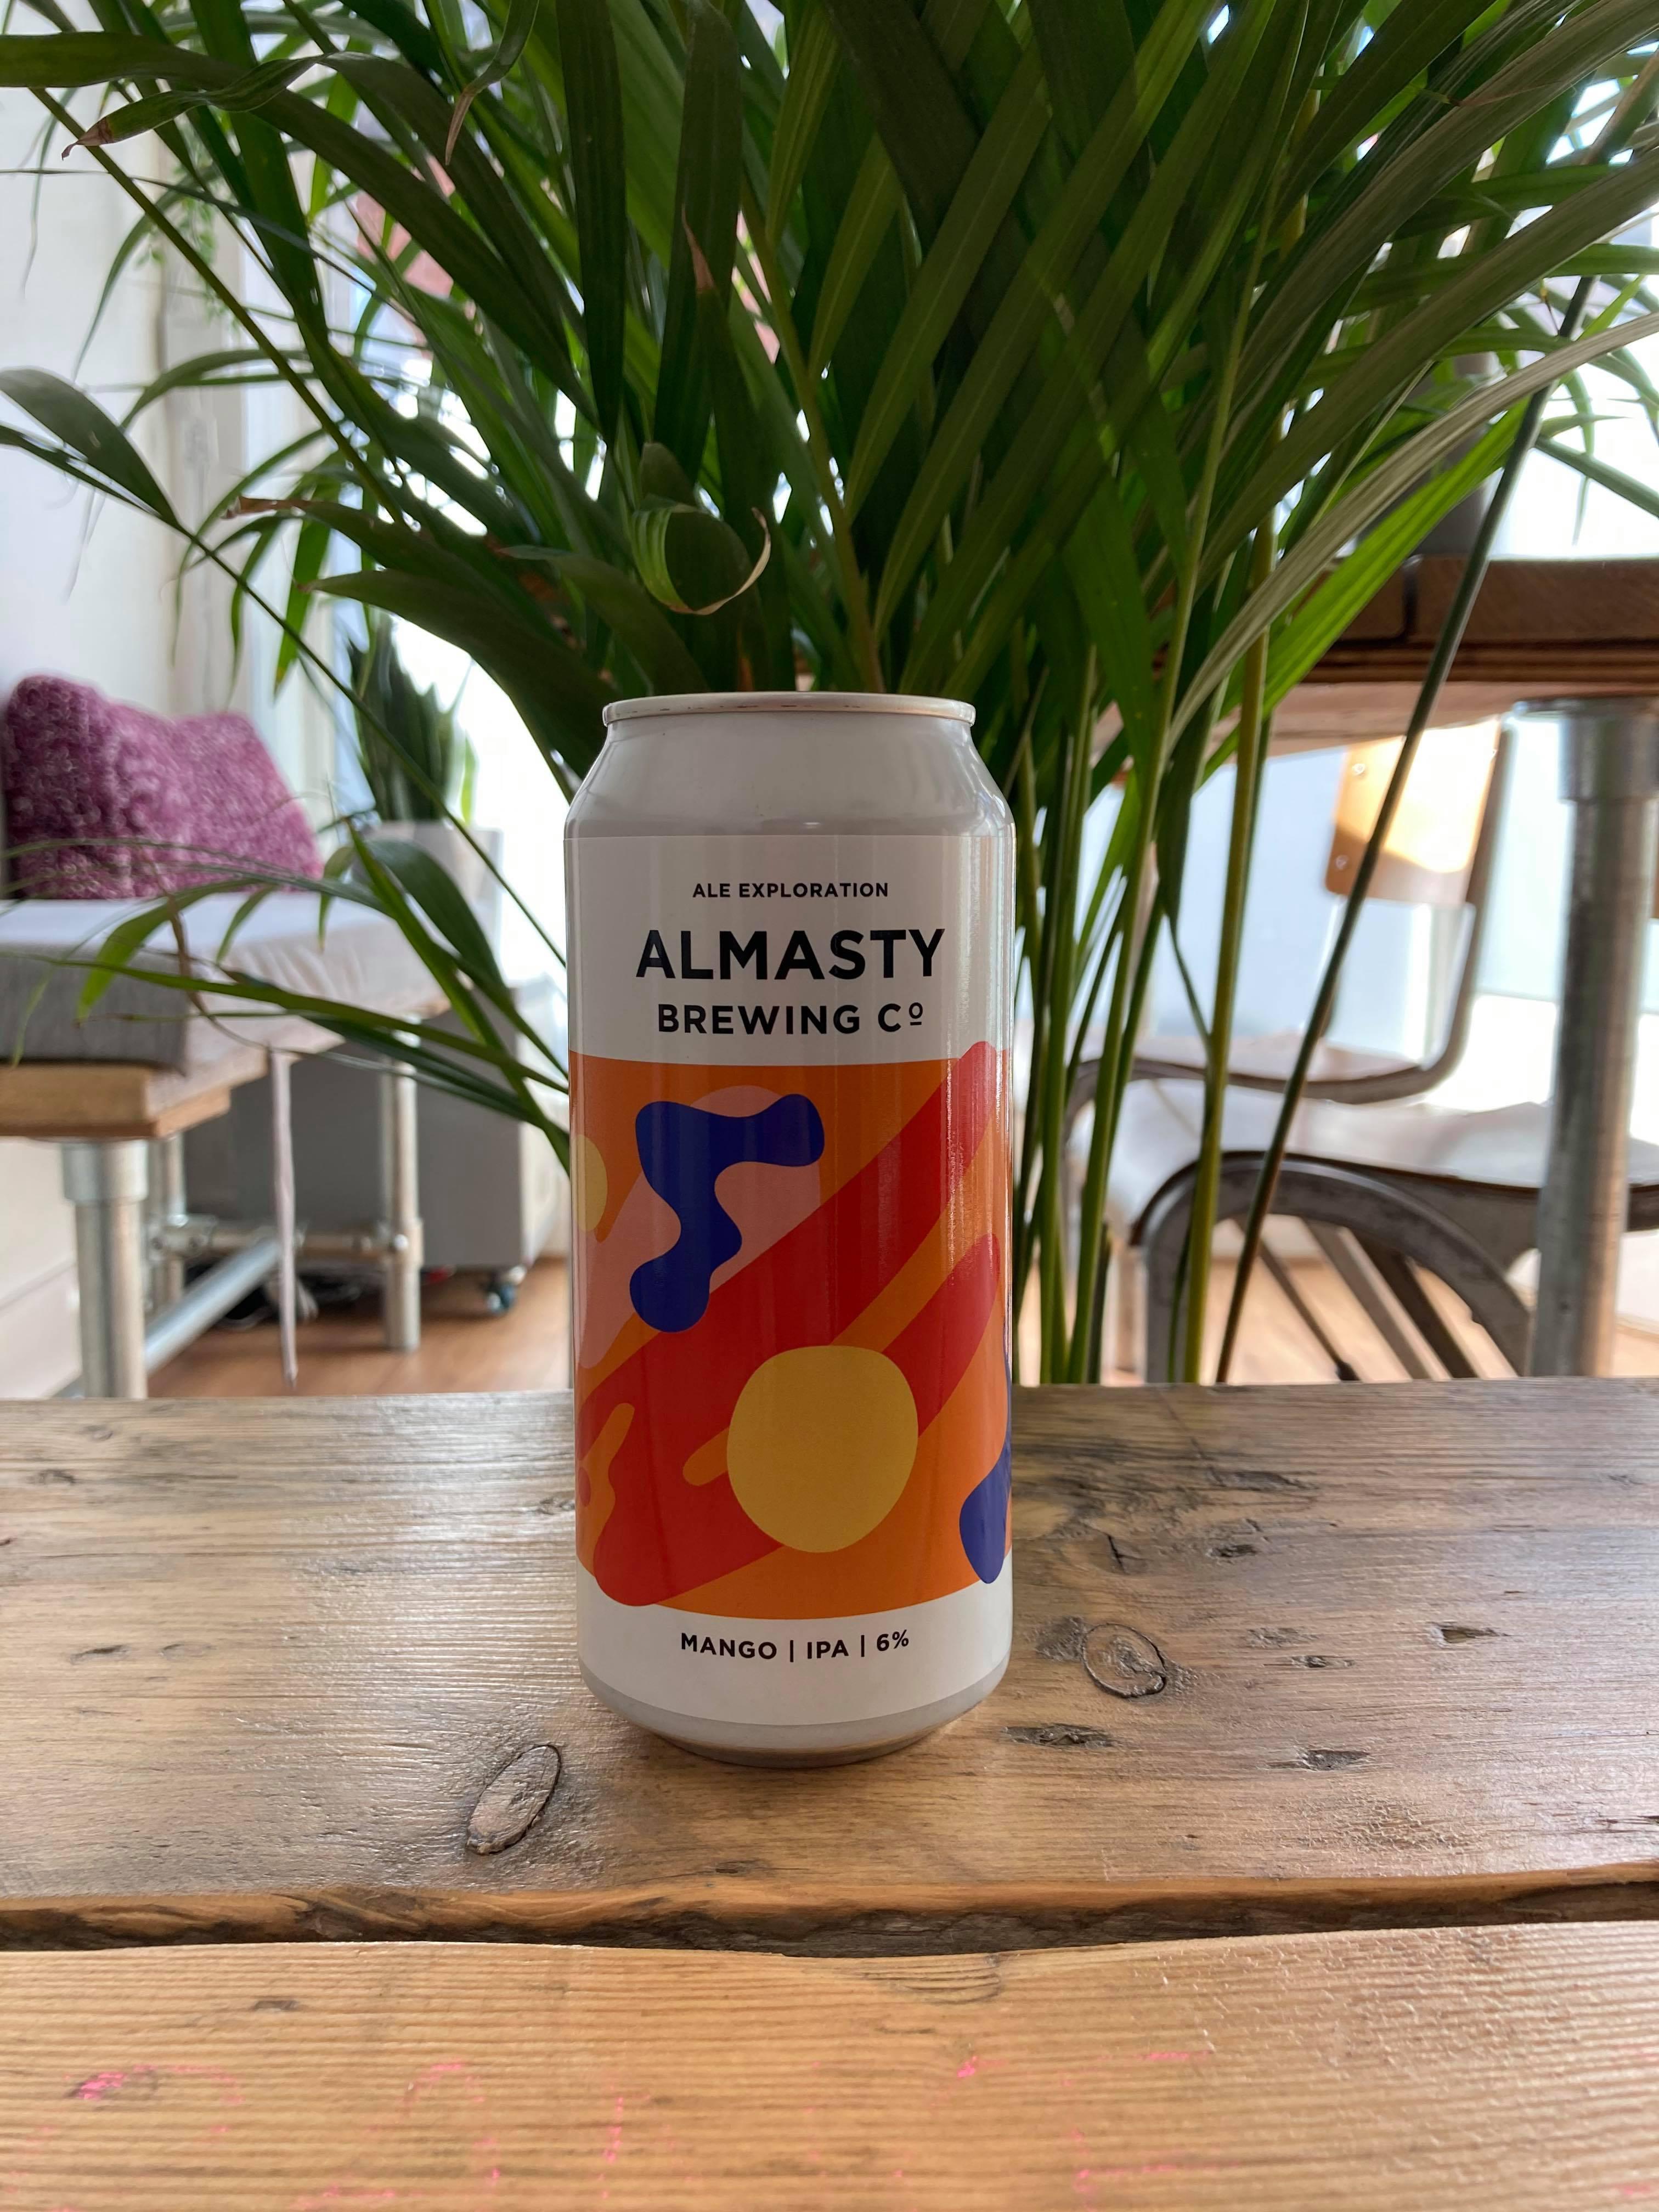 Almasty - Mango IPA 6%